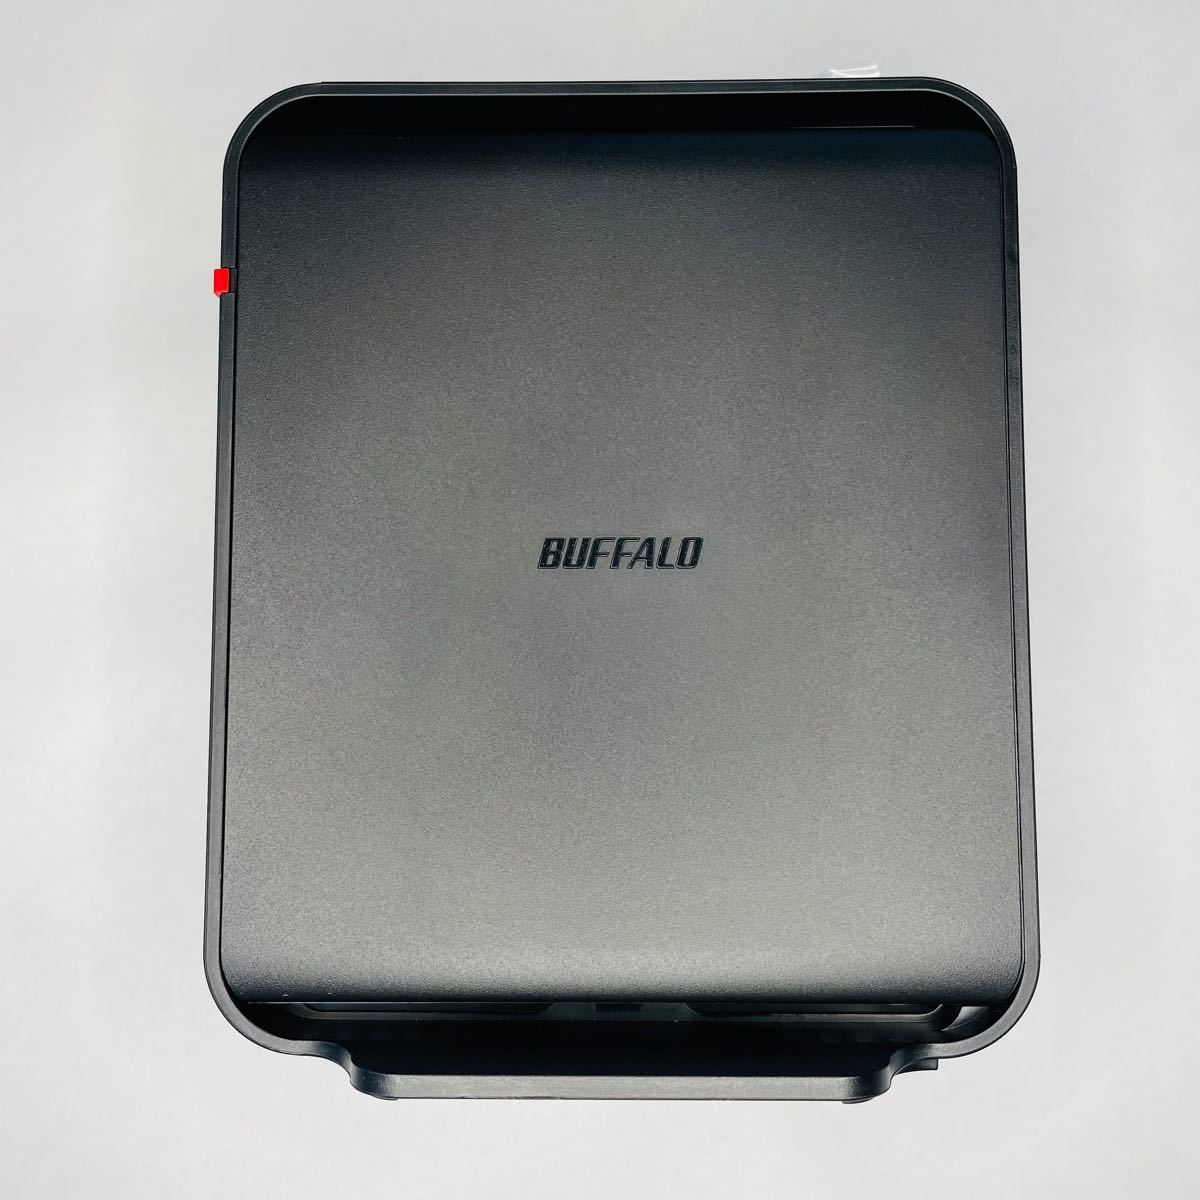 BUFFALO AirStation WHR-1166DHP4 無線LANルーター Wi-Fiルーター